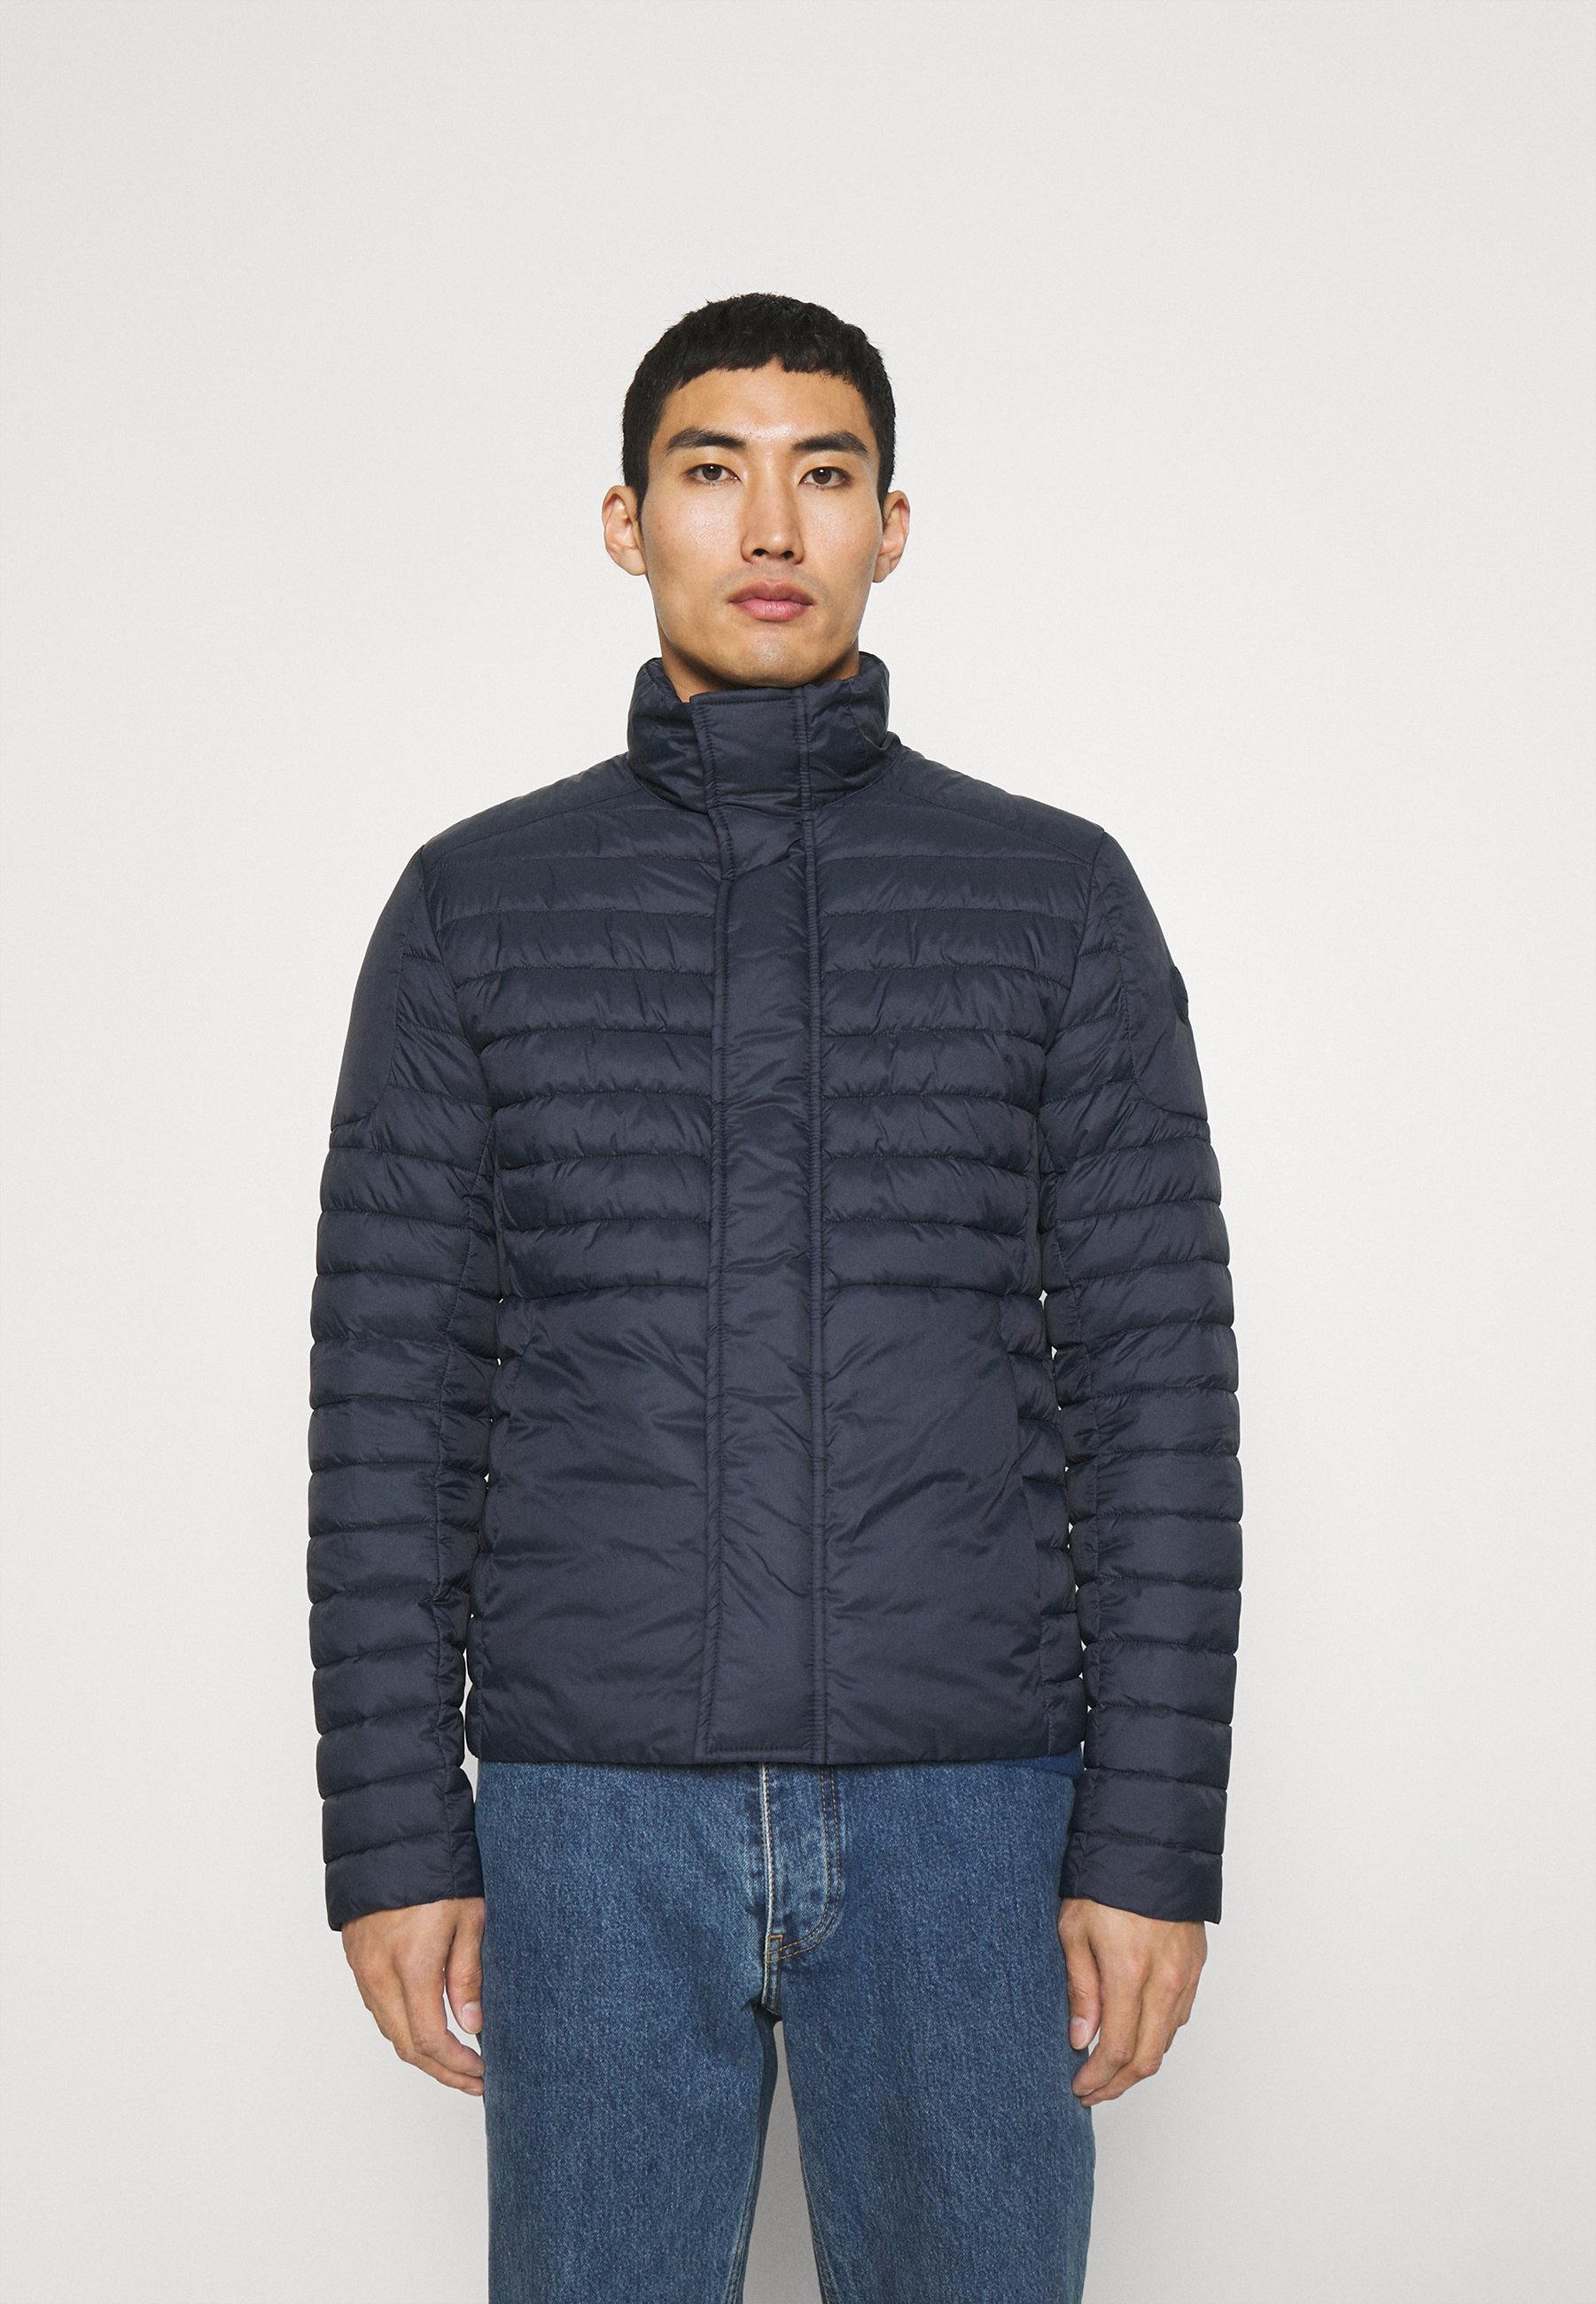 Men MENS INSULATED JACKET - Light jacket